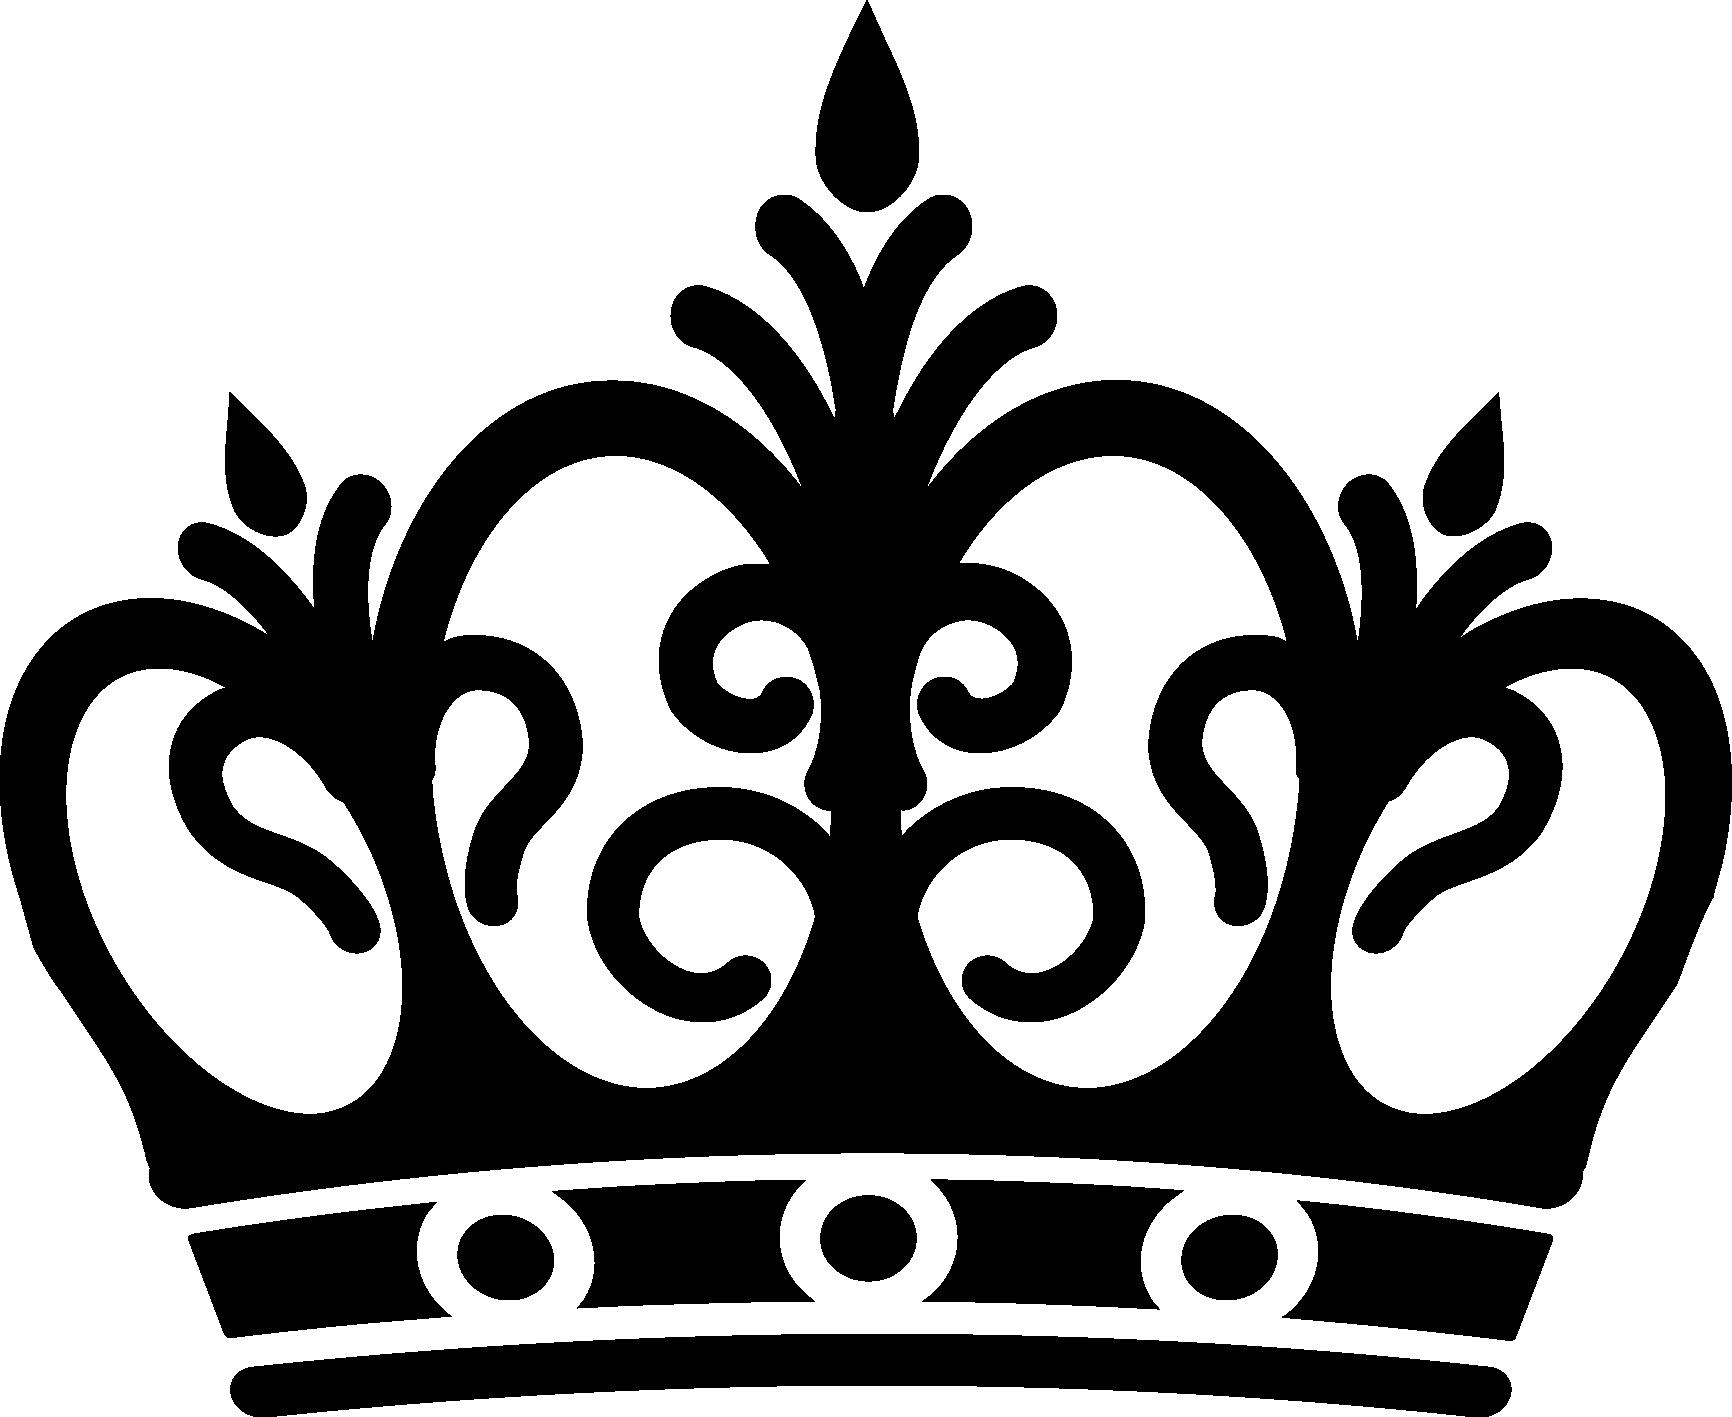 Clipart crown shadow. New black gallery digital